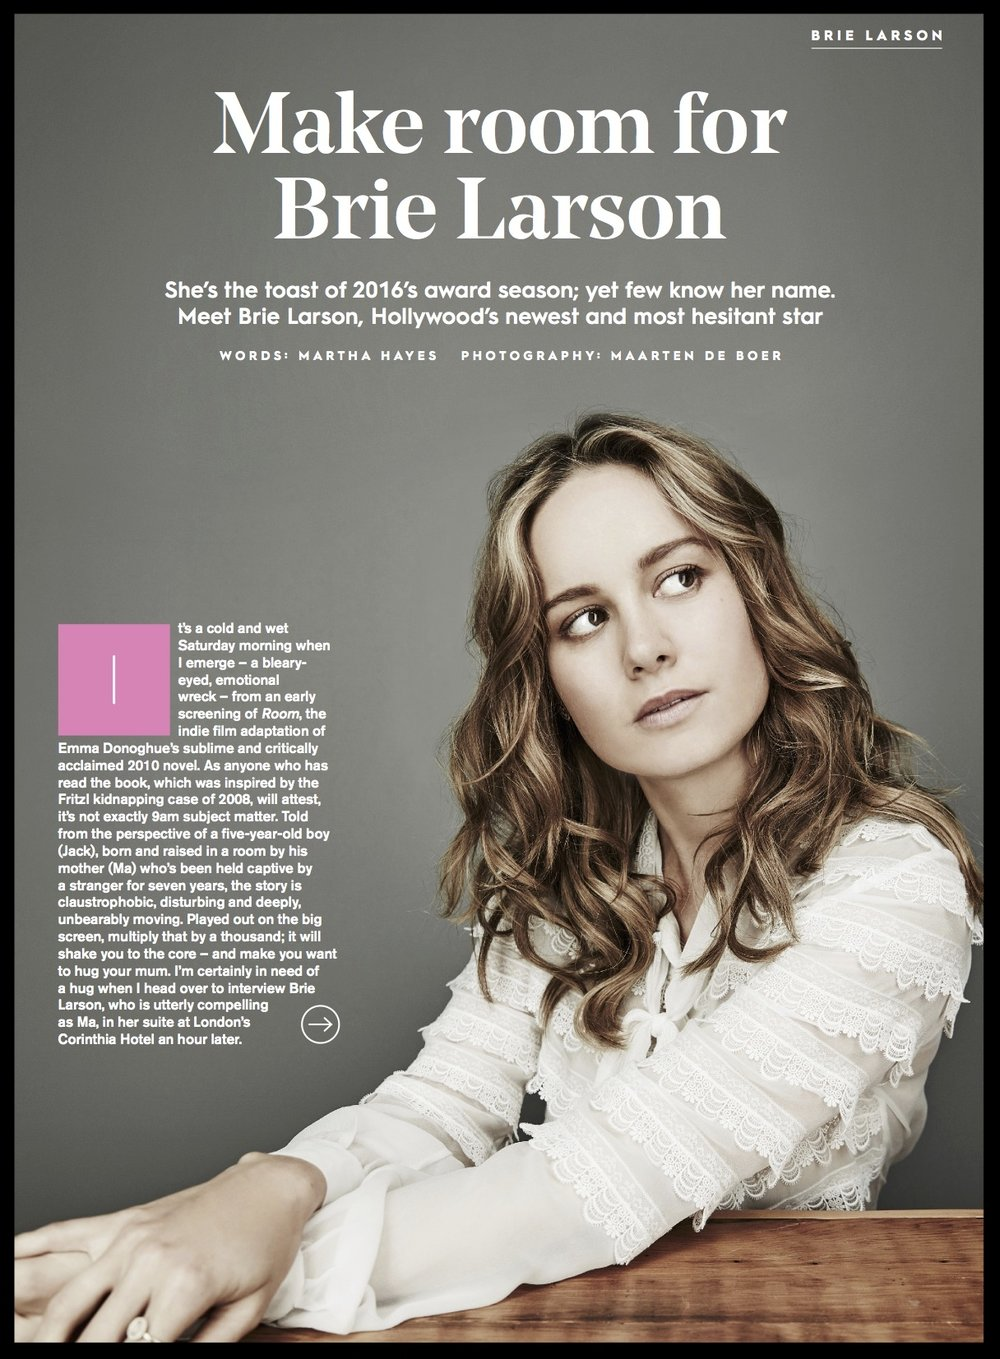 VIP4-brie larson-293036.jpg